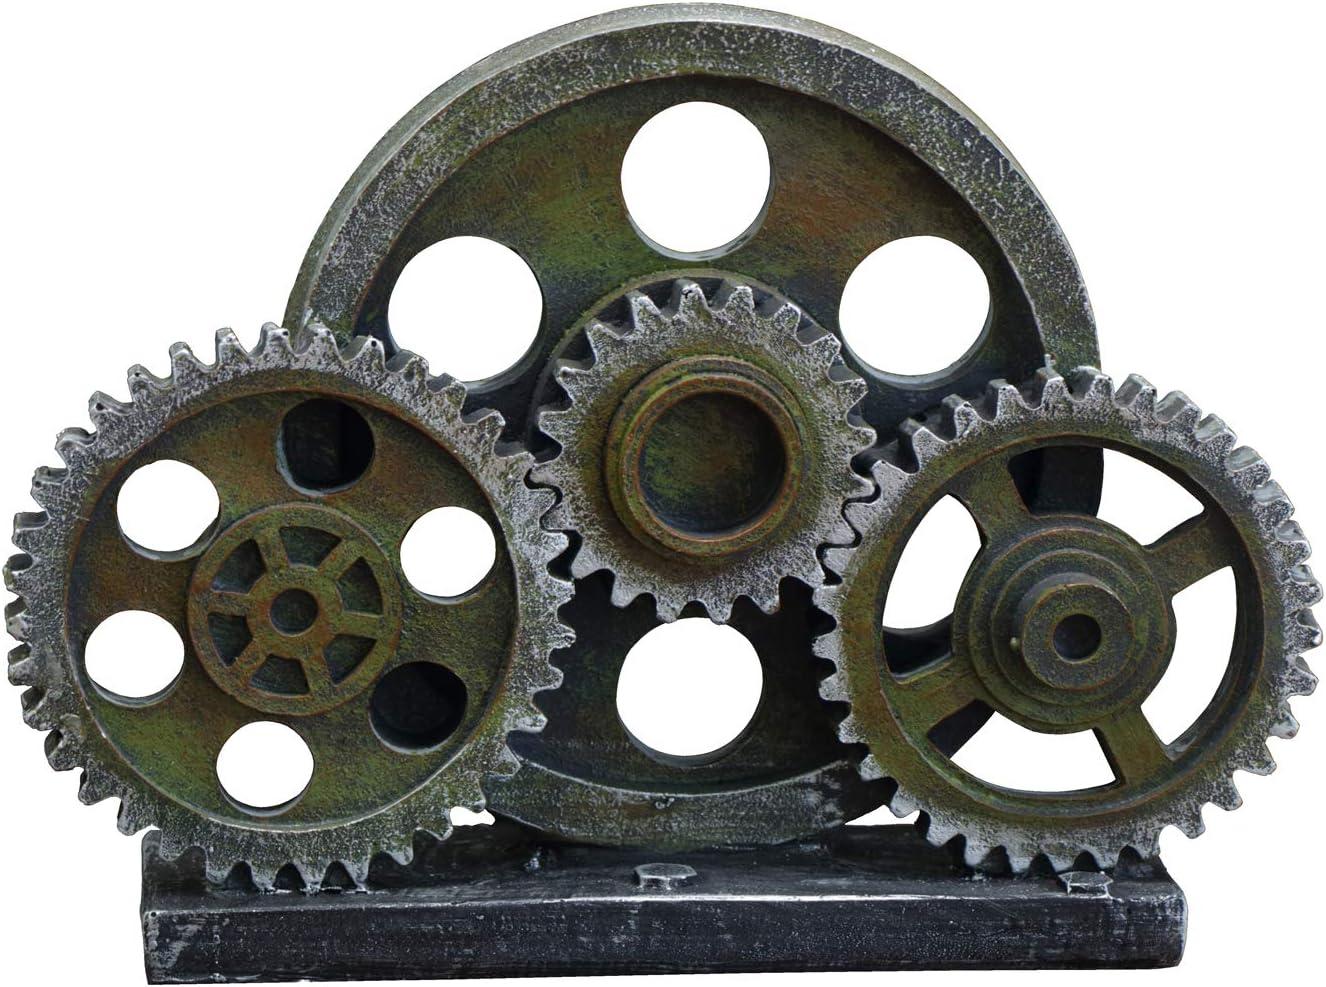 "Rmdusk Industrial Steampunk Gear Train Figurine, Cog Wheel Statue, Resin Model, Home Bar Décor Ornament 7.7"" H Green Patina"